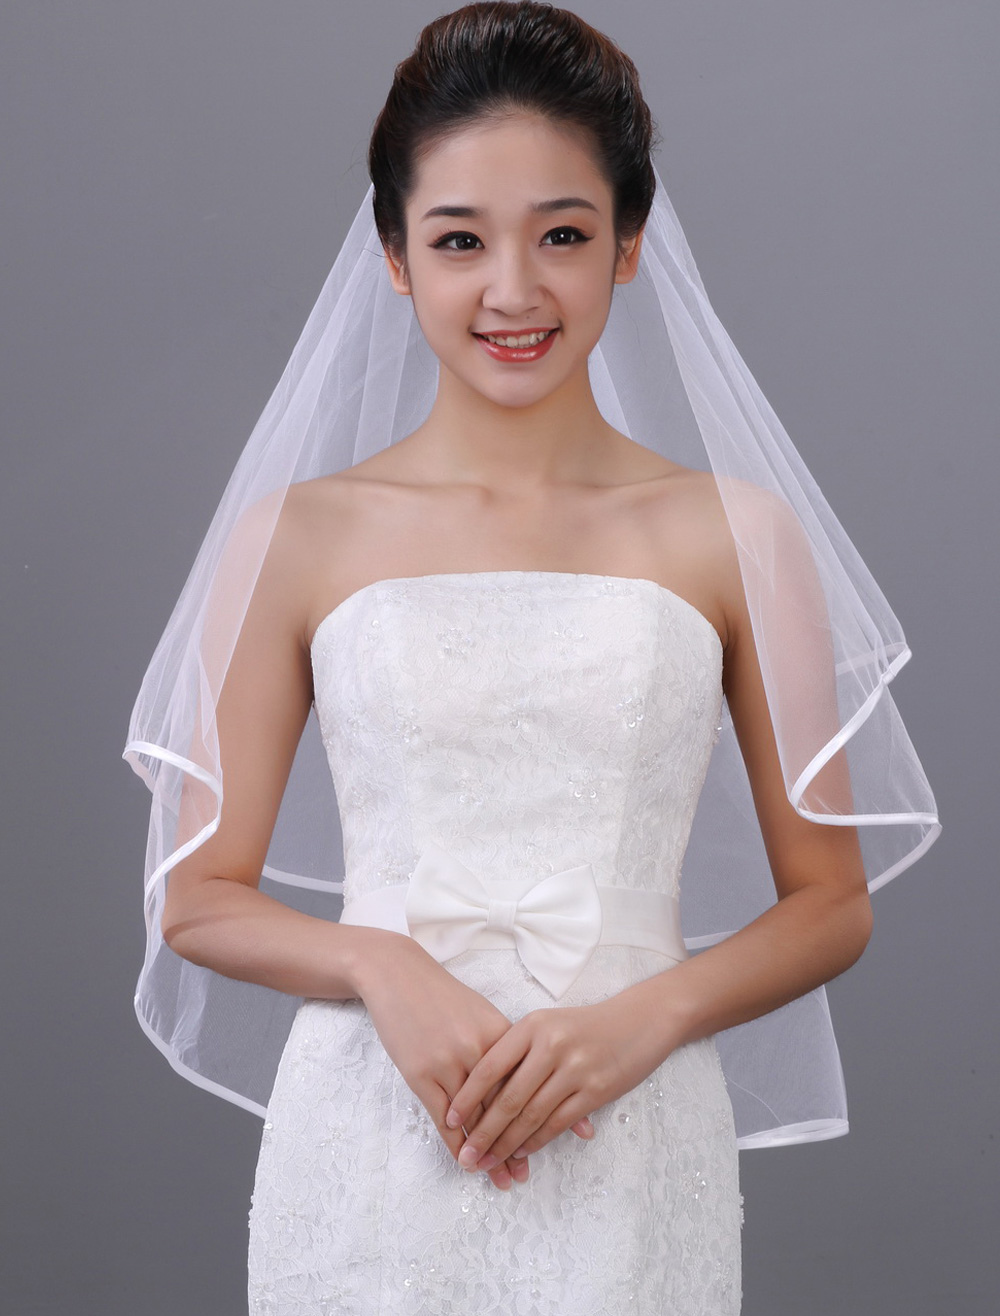 One-Tier Tulle Wedding Veils